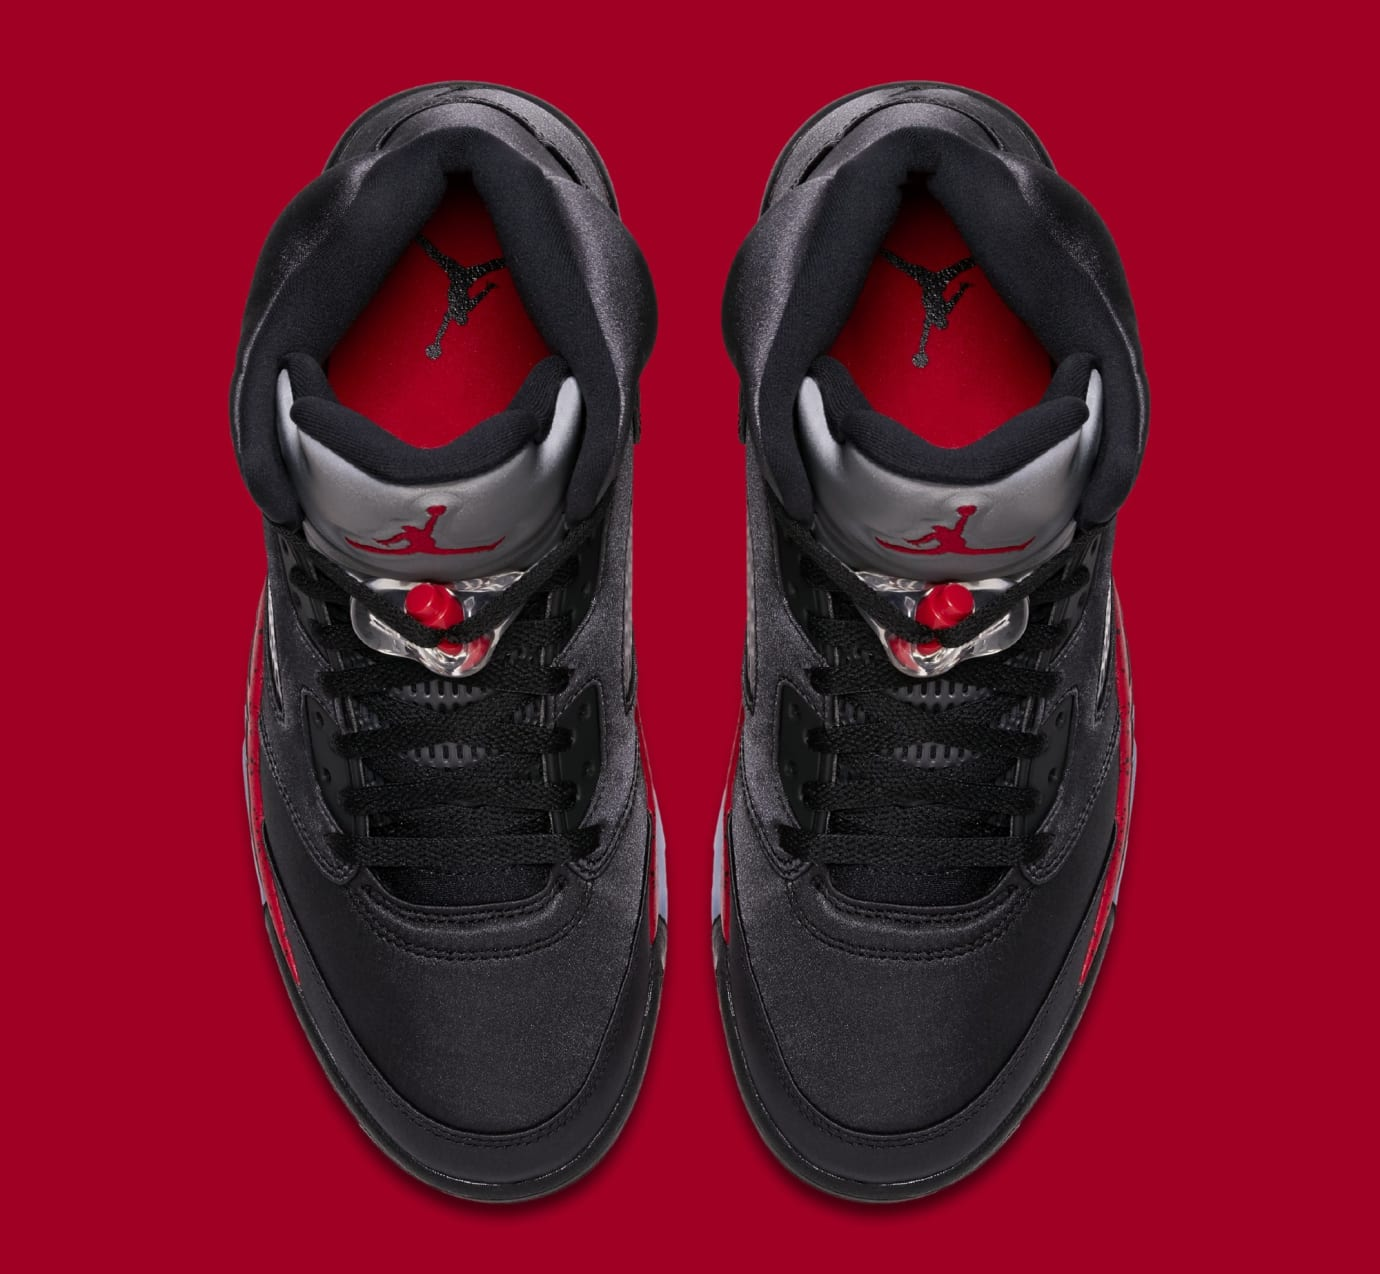 Image via Nike Air Jordan 5 Retro  Black University Red  136027-006 (Top) 1d9b28b3f